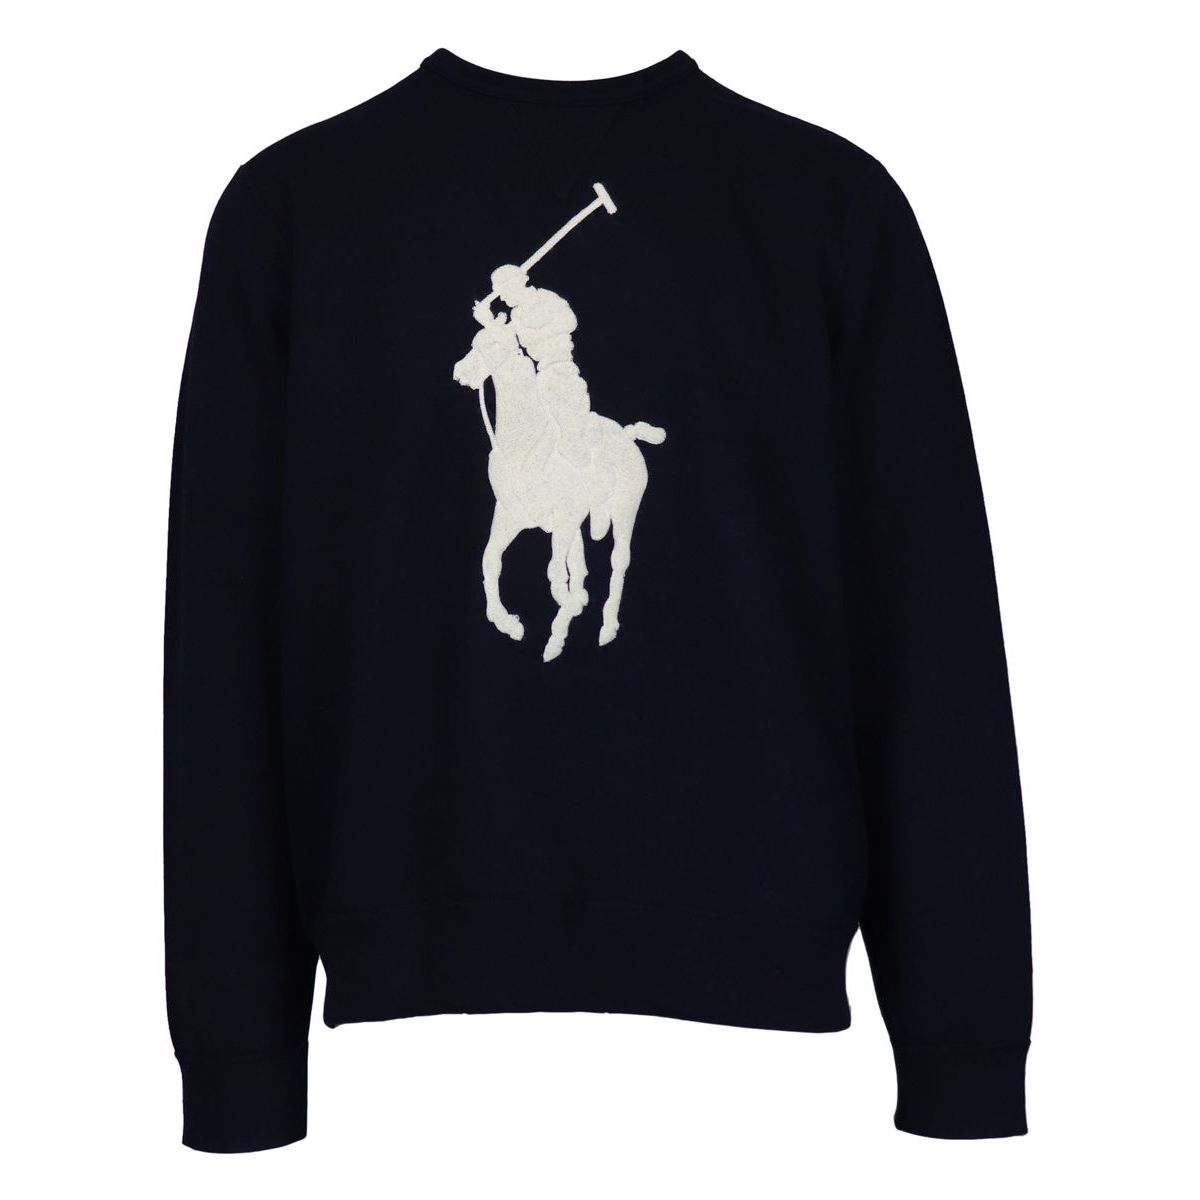 Cotton sweatshirt with maxi sponge logo Navy Polo Ralph Lauren